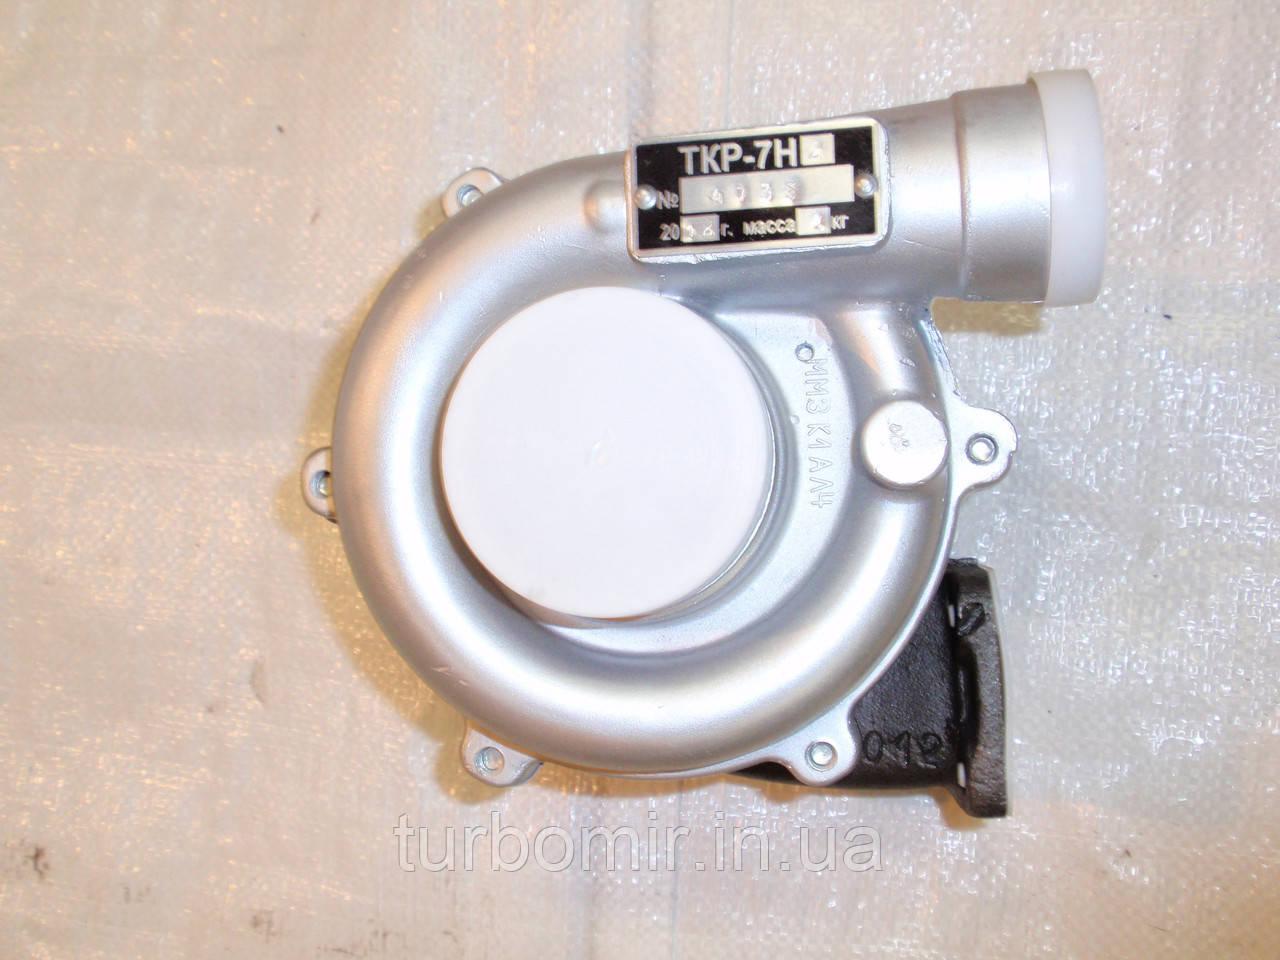 Турбокомпрессор (турбина) ТКР 7H2A ЗИЛ5301,МТЗ-100